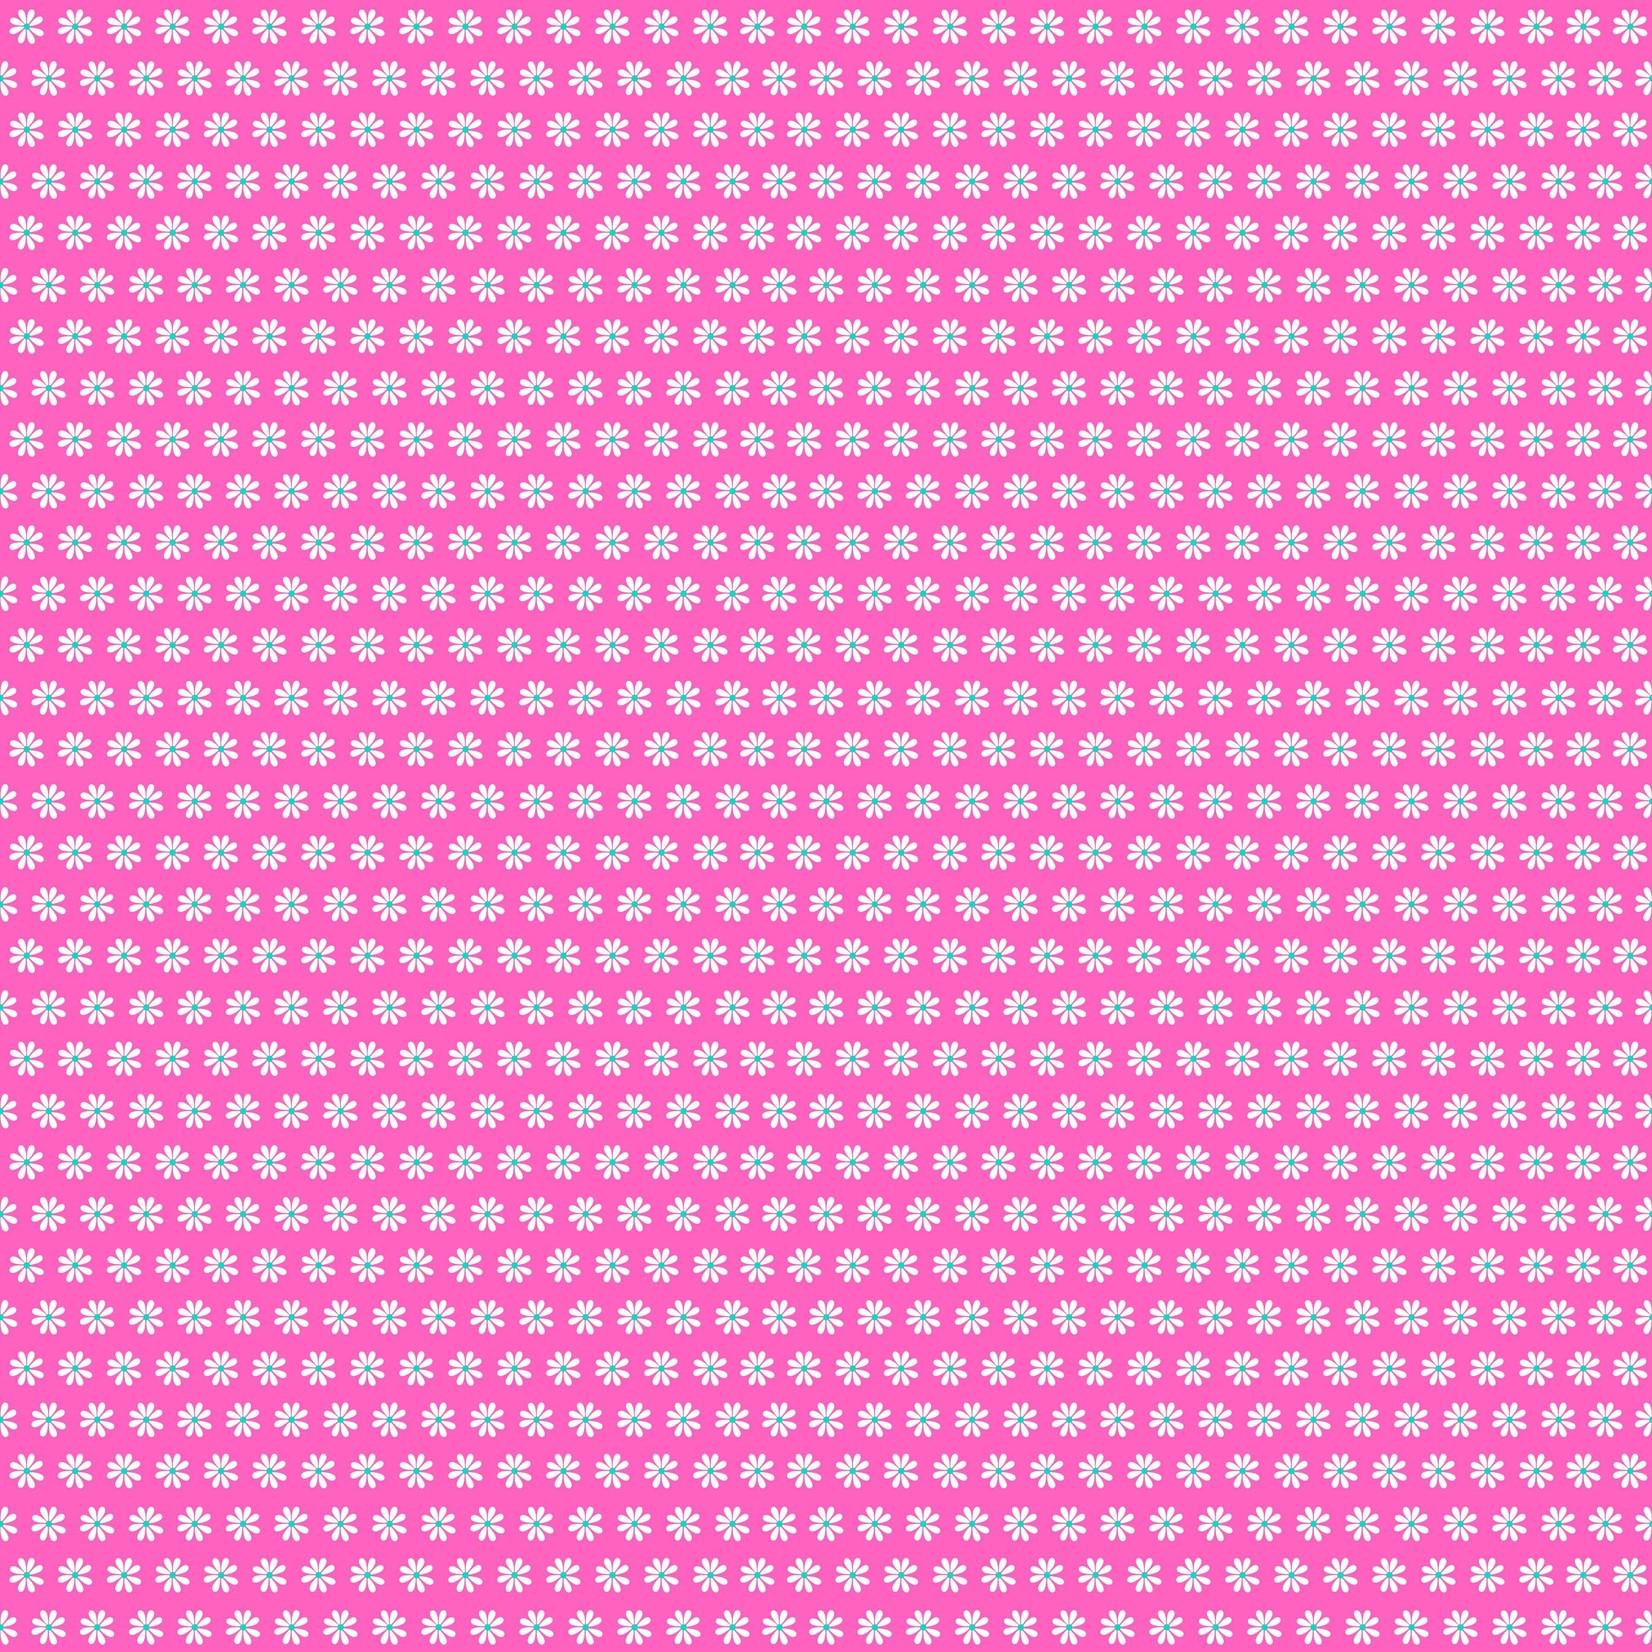 TVD Daisies Pink